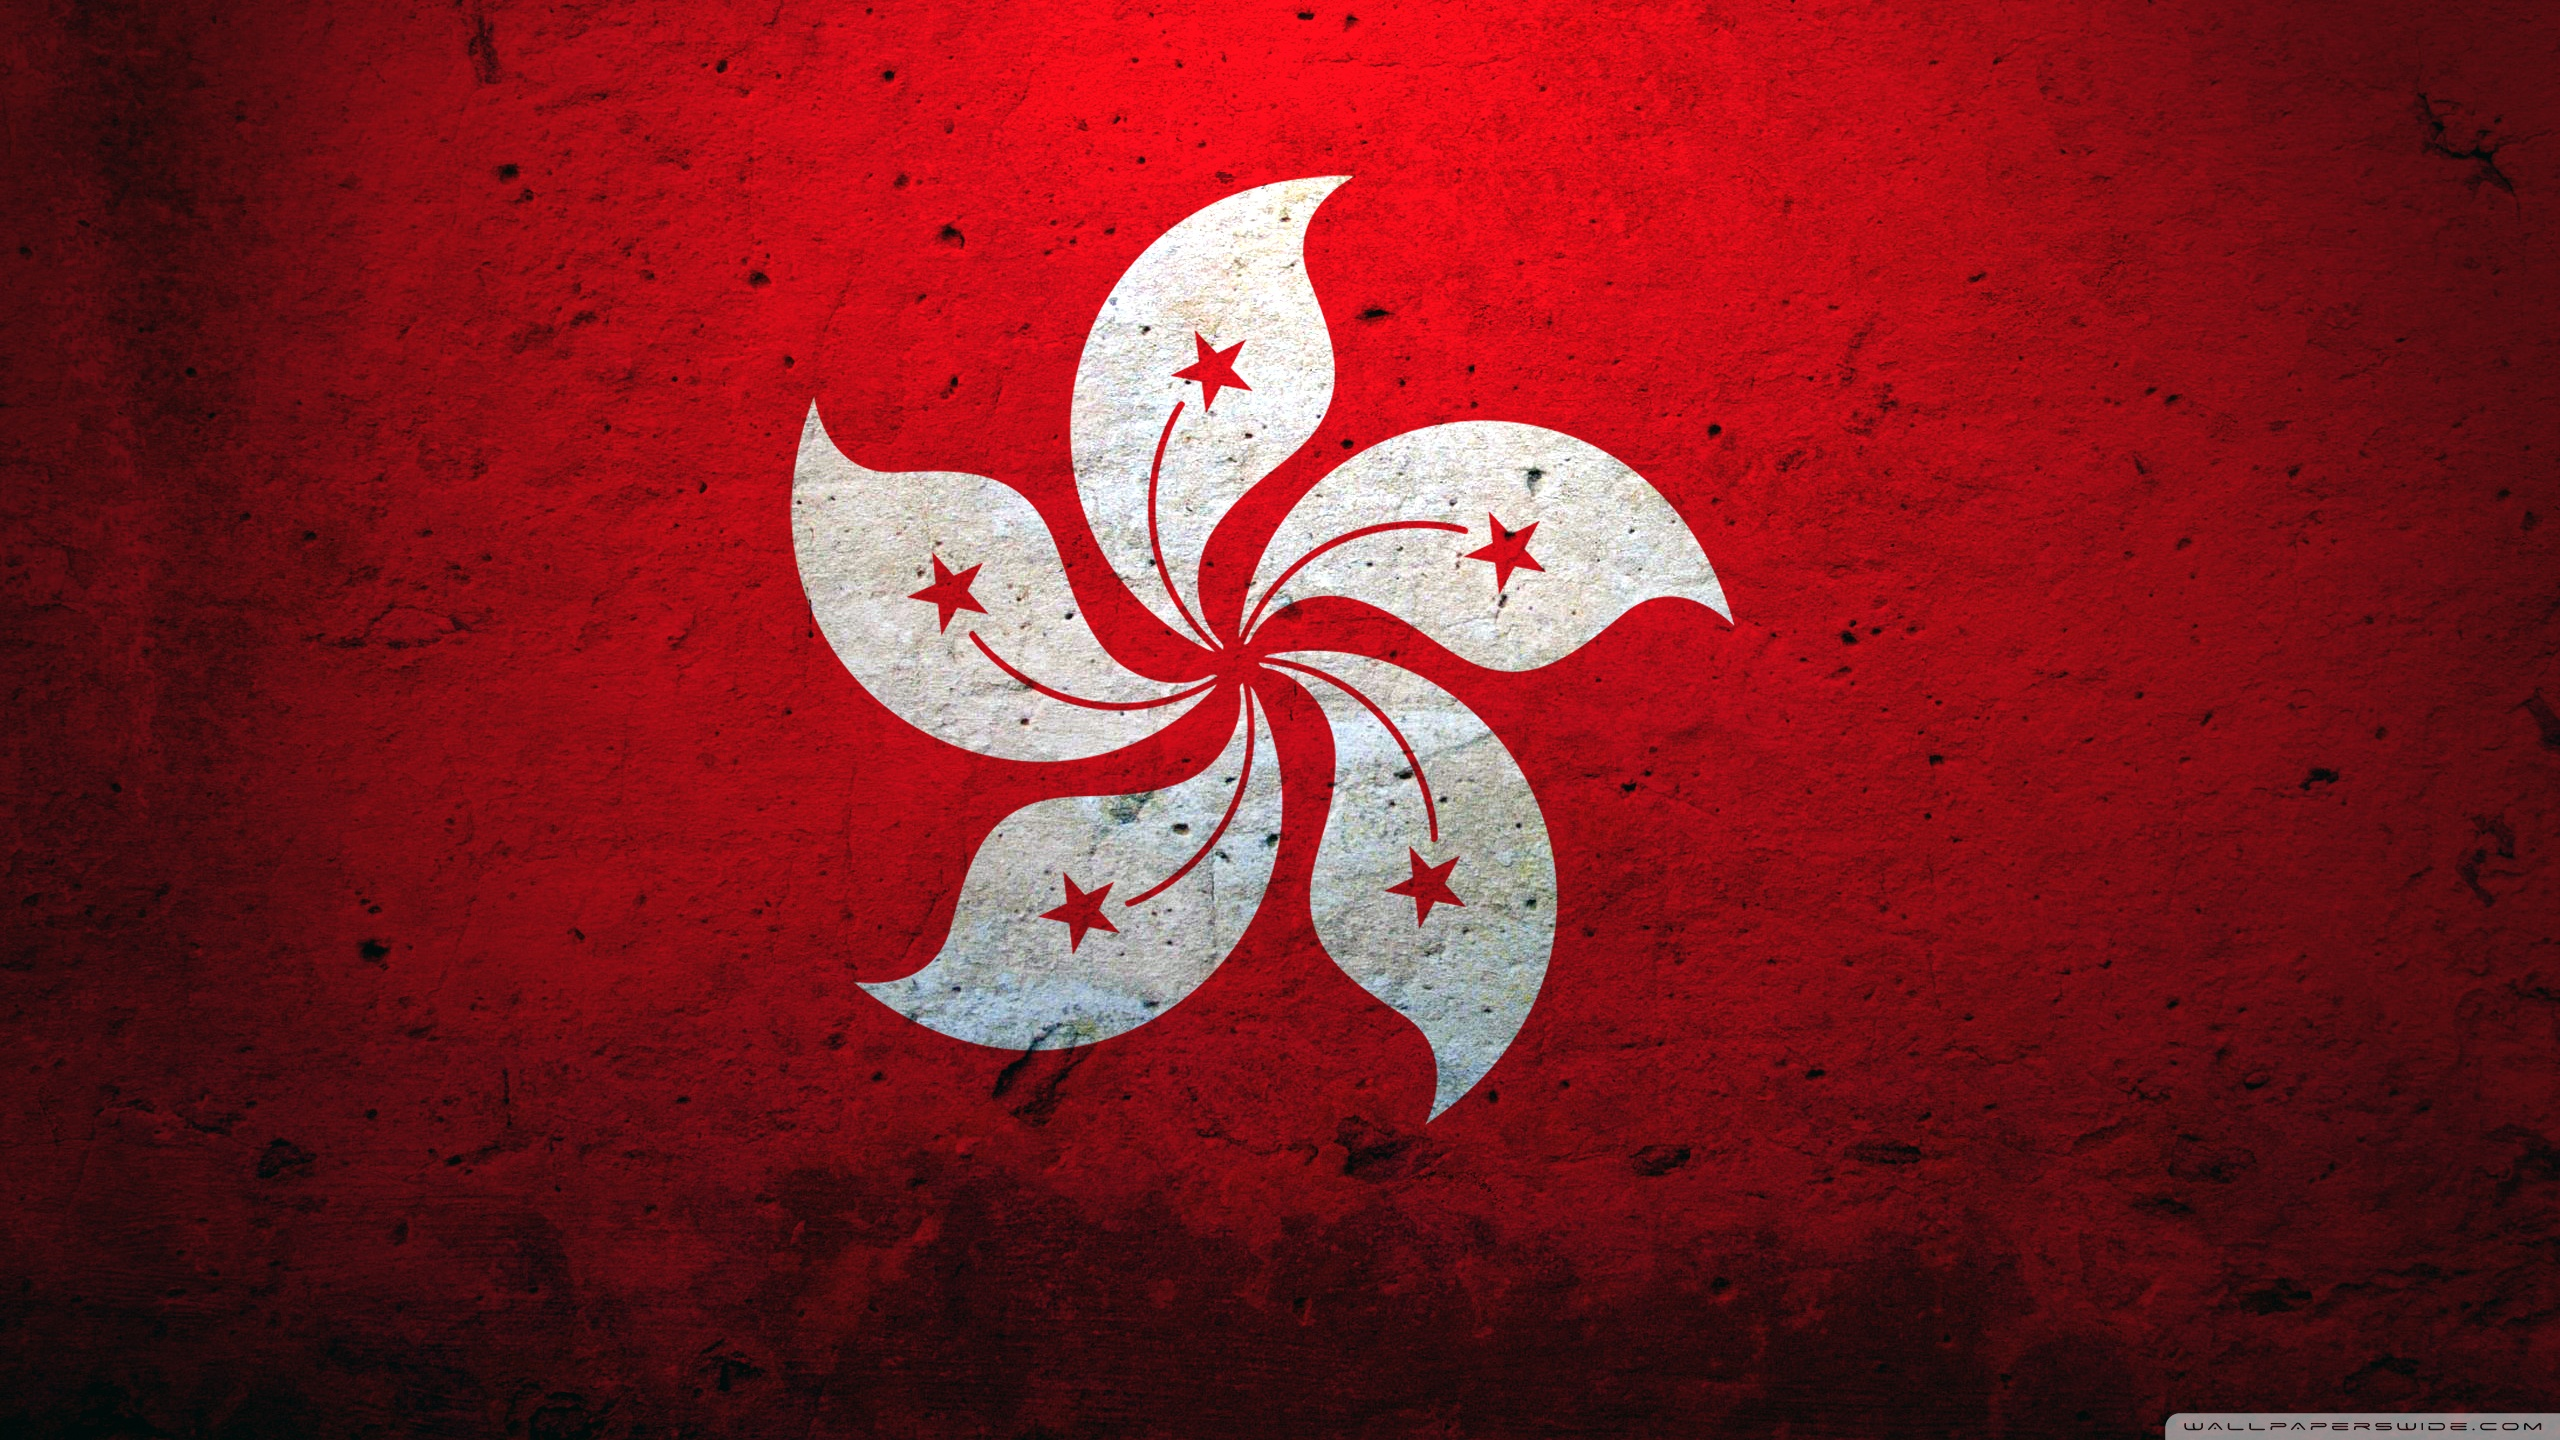 Hong Kong China Flag 4K HD Desktop Wallpaper for 4K Ultra HD TV 2560x1440